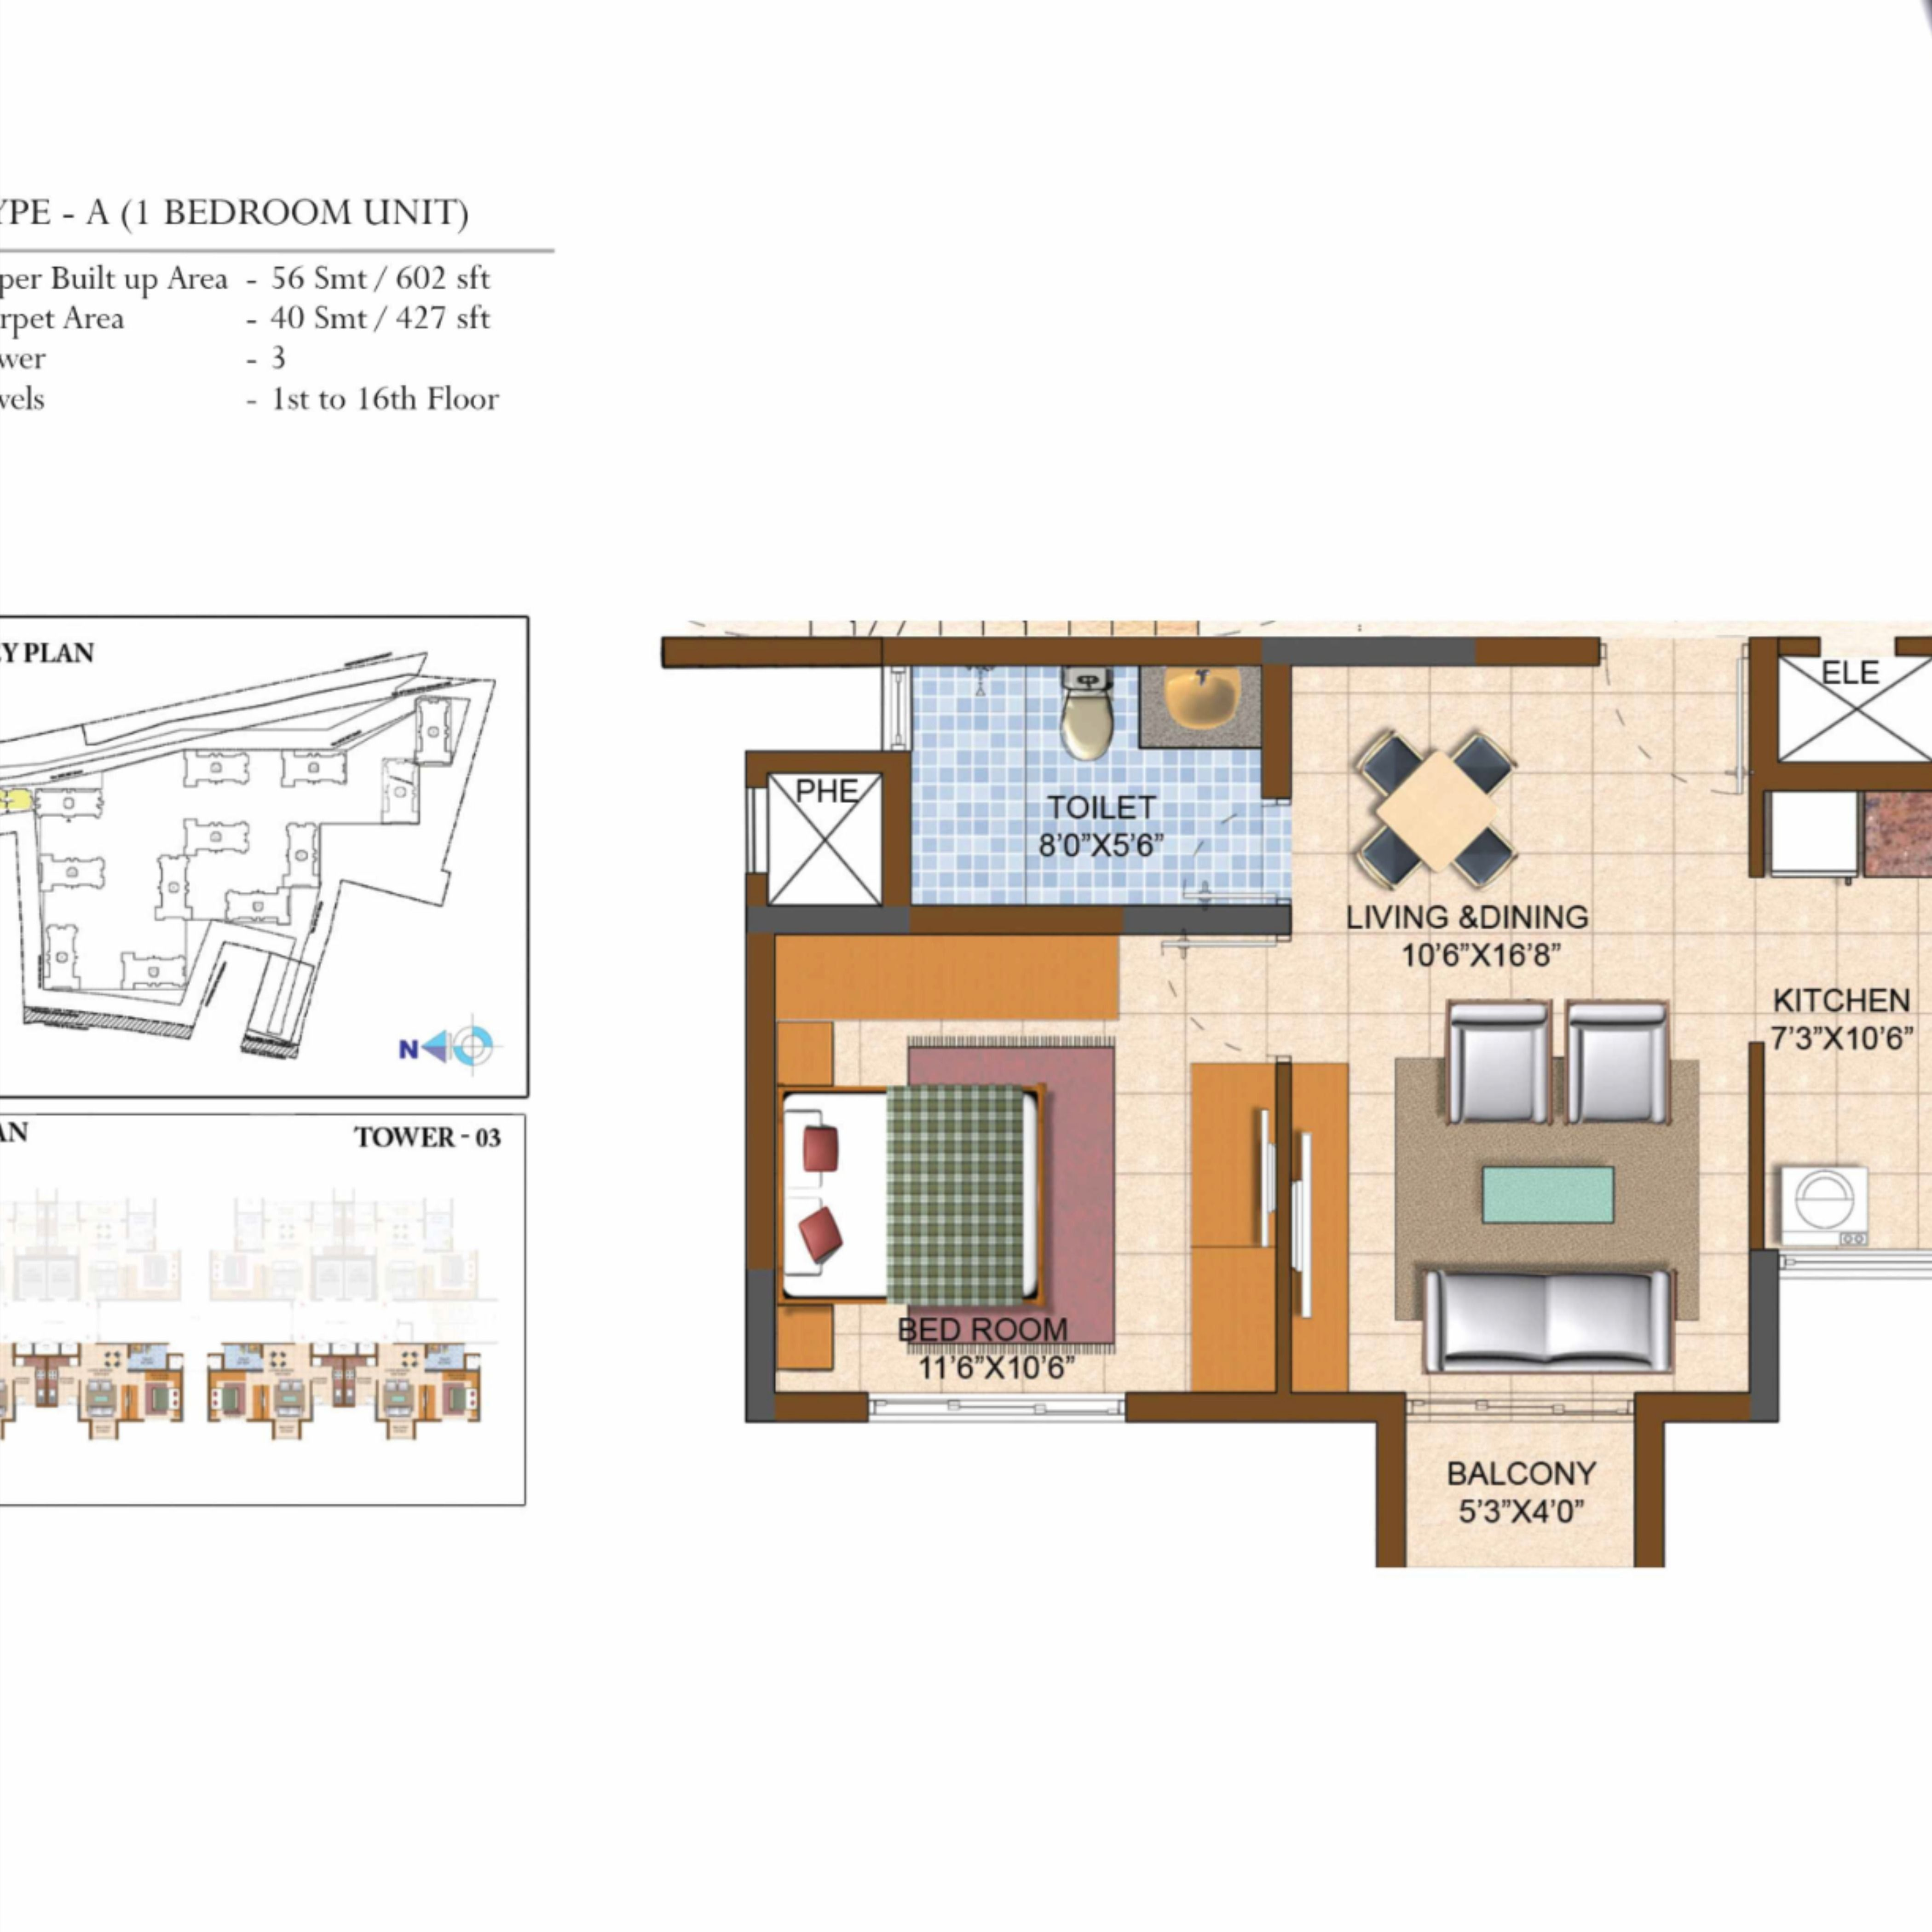 Prestige Royale Gardens Unit Plans In 2020 The Prestige Unit Plan Residential Apartments